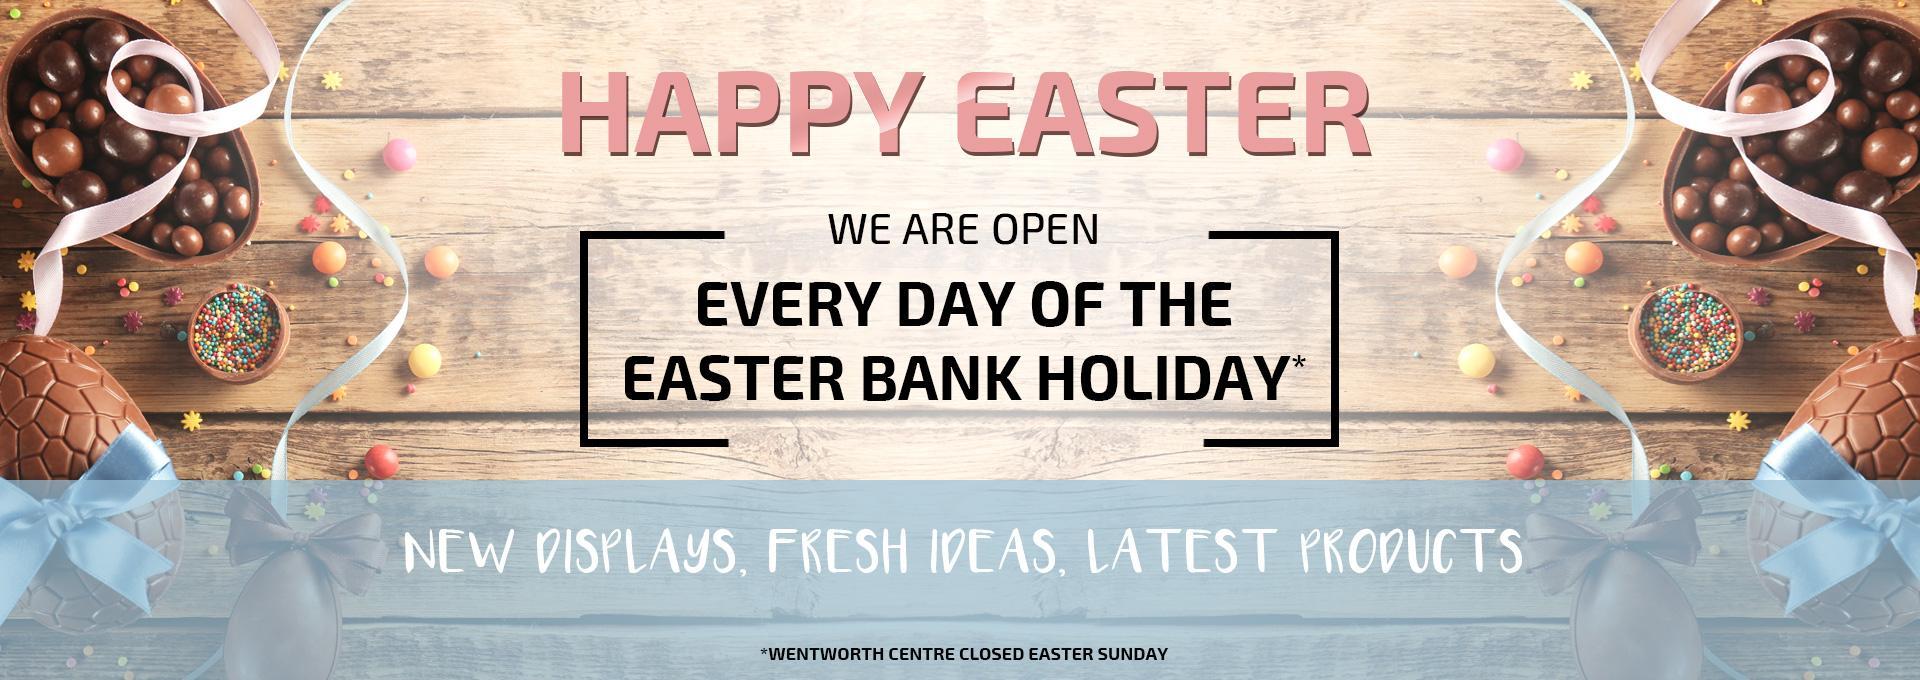 Easter desktop web banner for earnshaws fencing centre